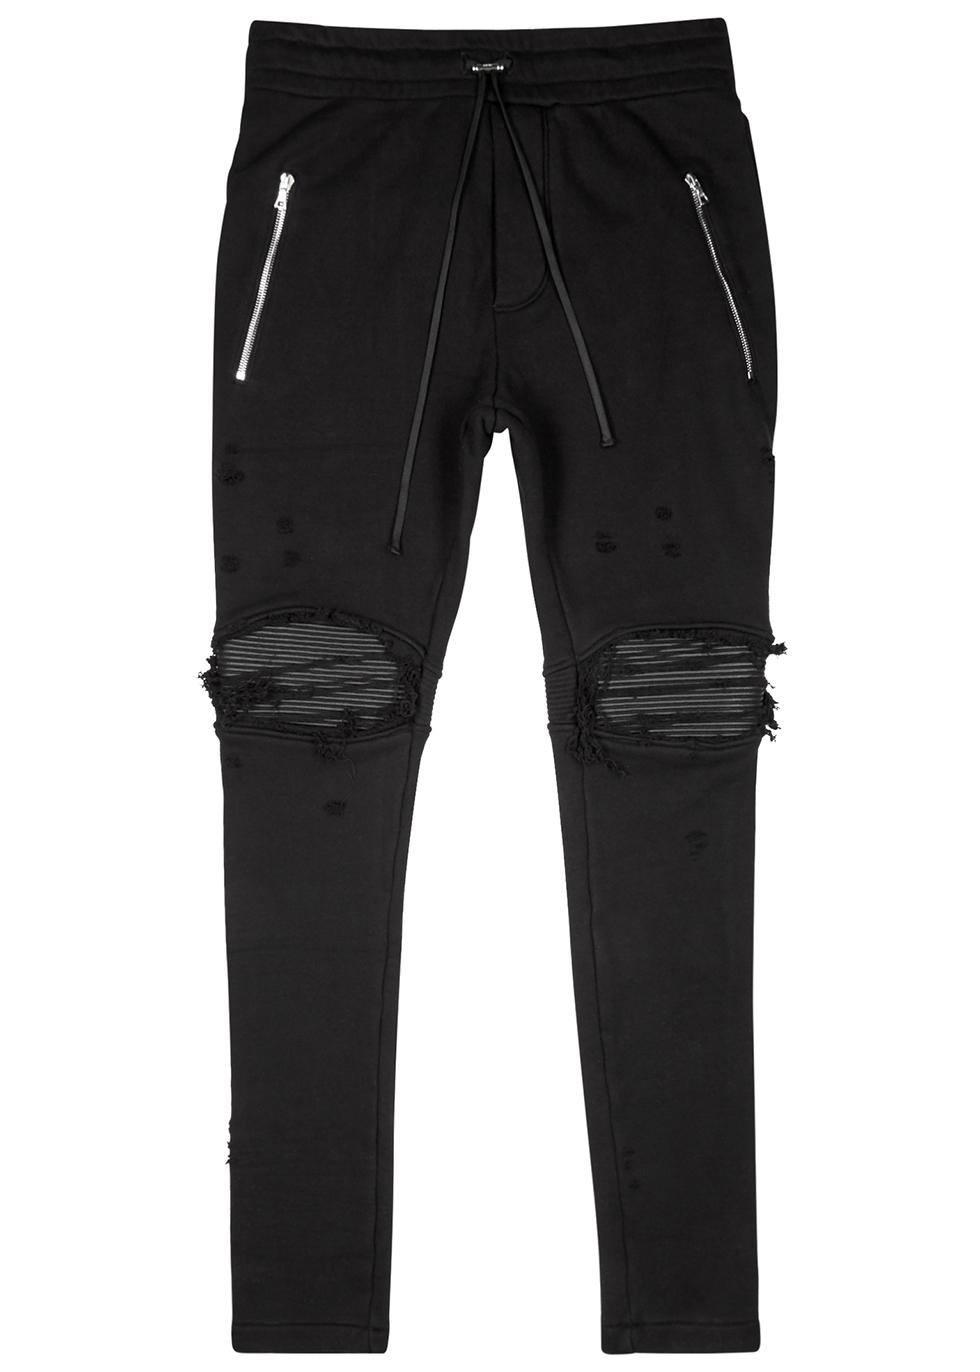 1800c3df2572 New In Men s Designer Clothing and Fashion - Harvey Nichols